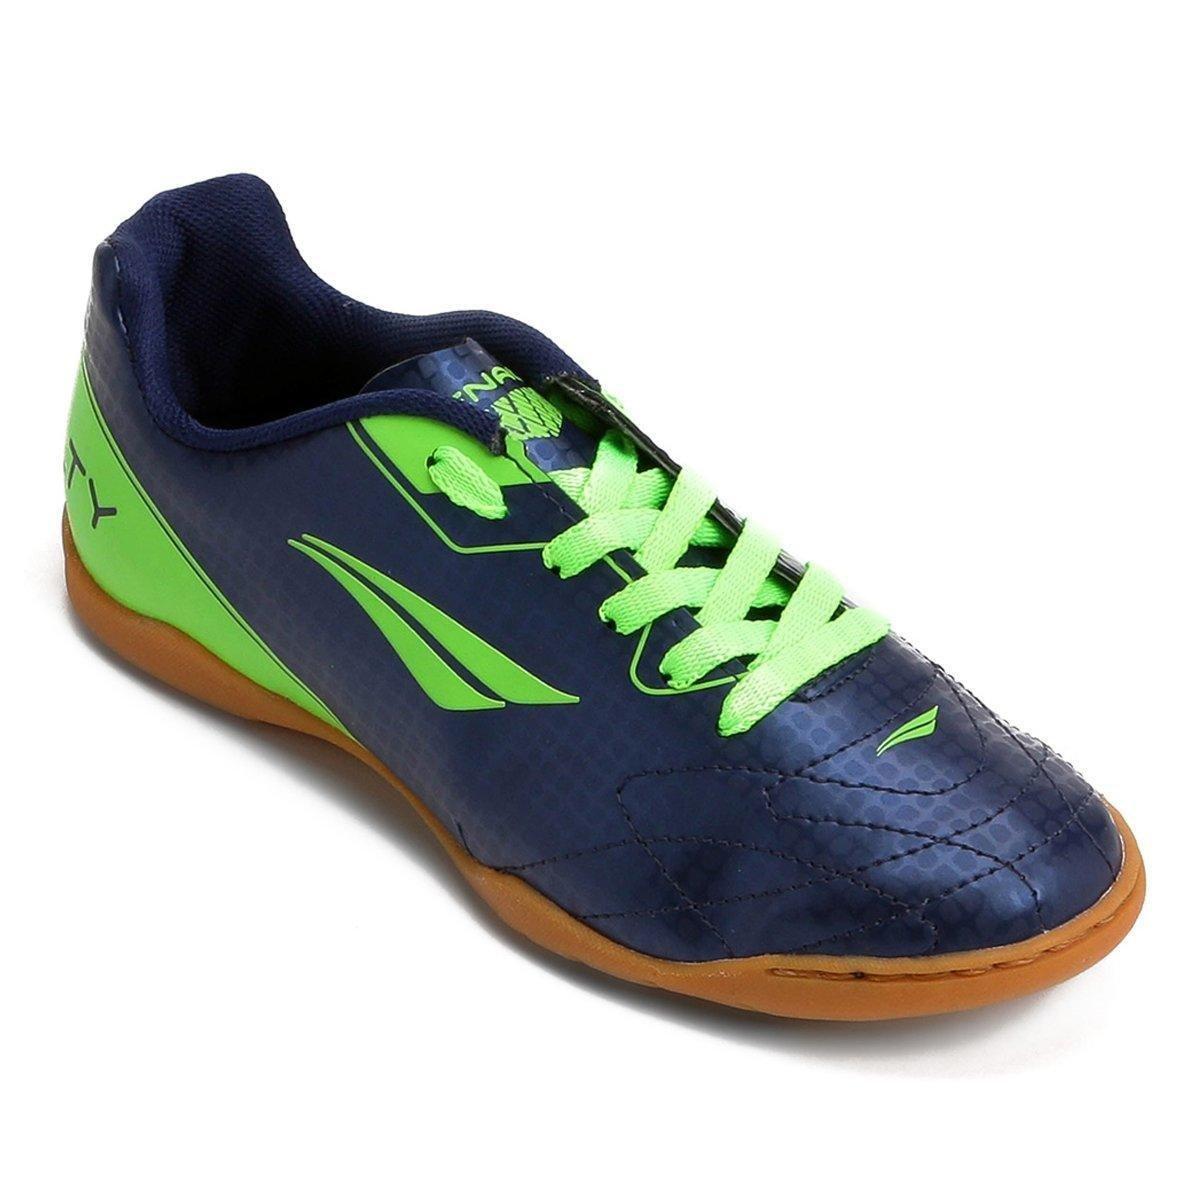 Tenis Penalty Azul/Amarelo Masculino K Soccer Matis